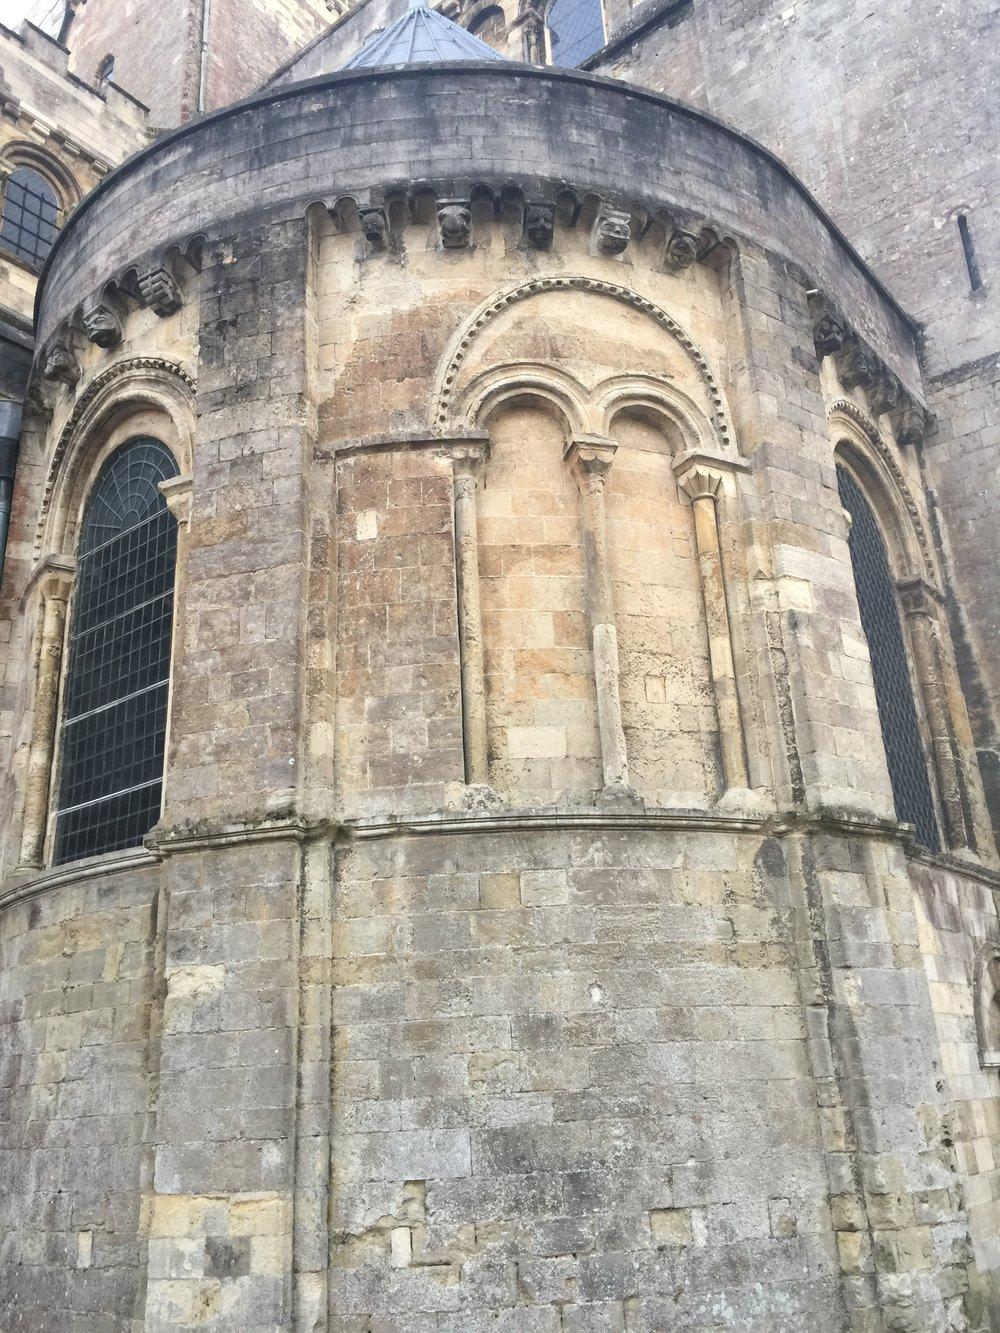 Corbel details on exterior